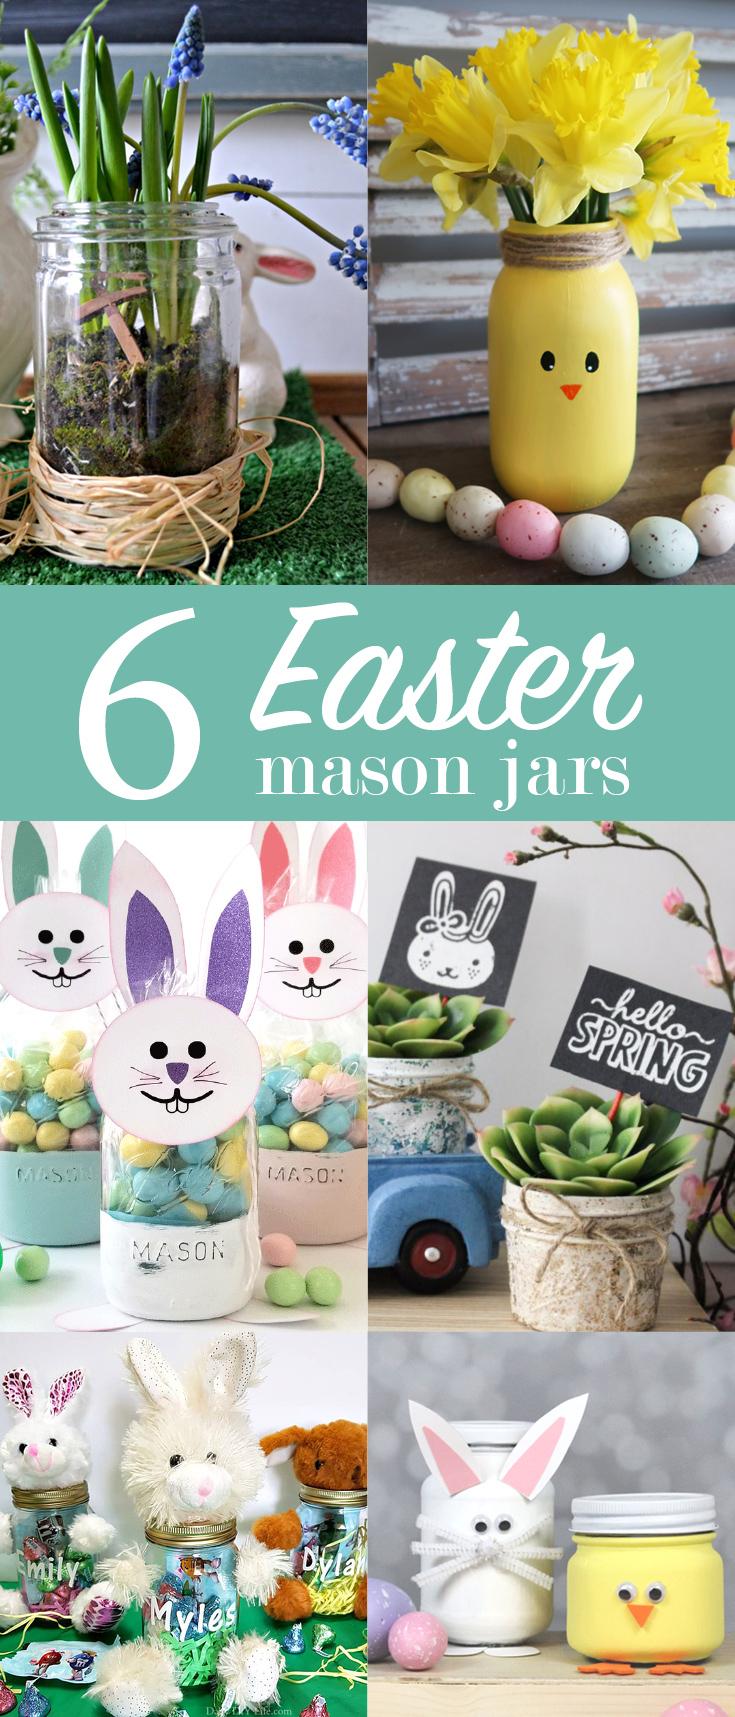 6_Easter_Mason_Jars.jpg